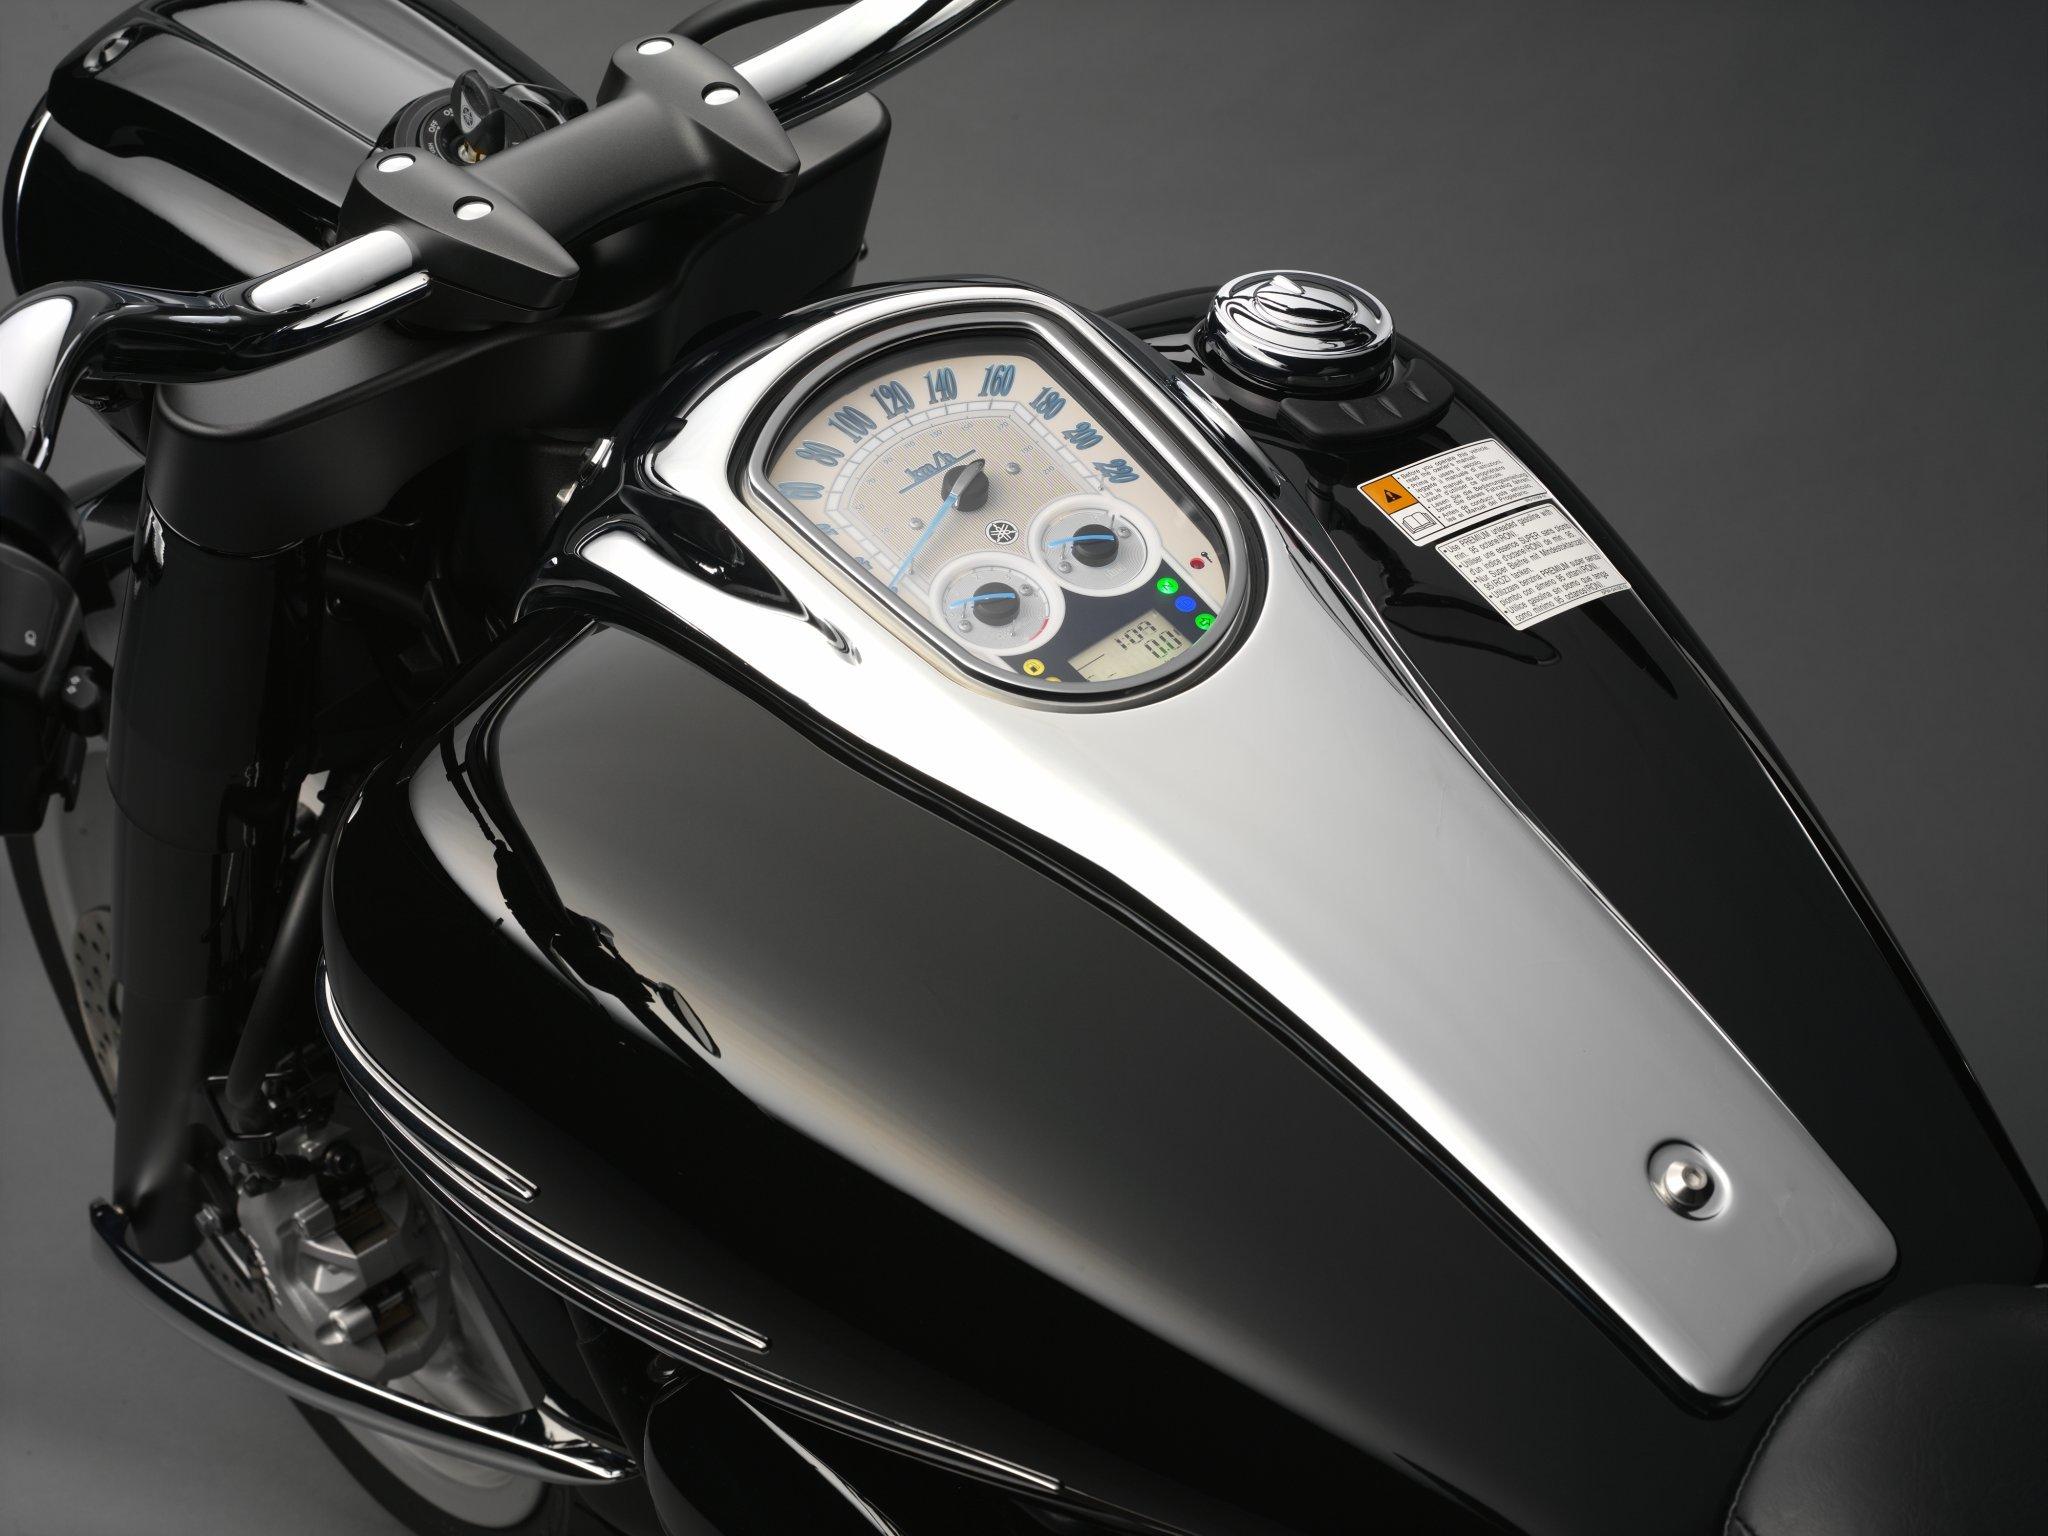 Yamaha XV1900A